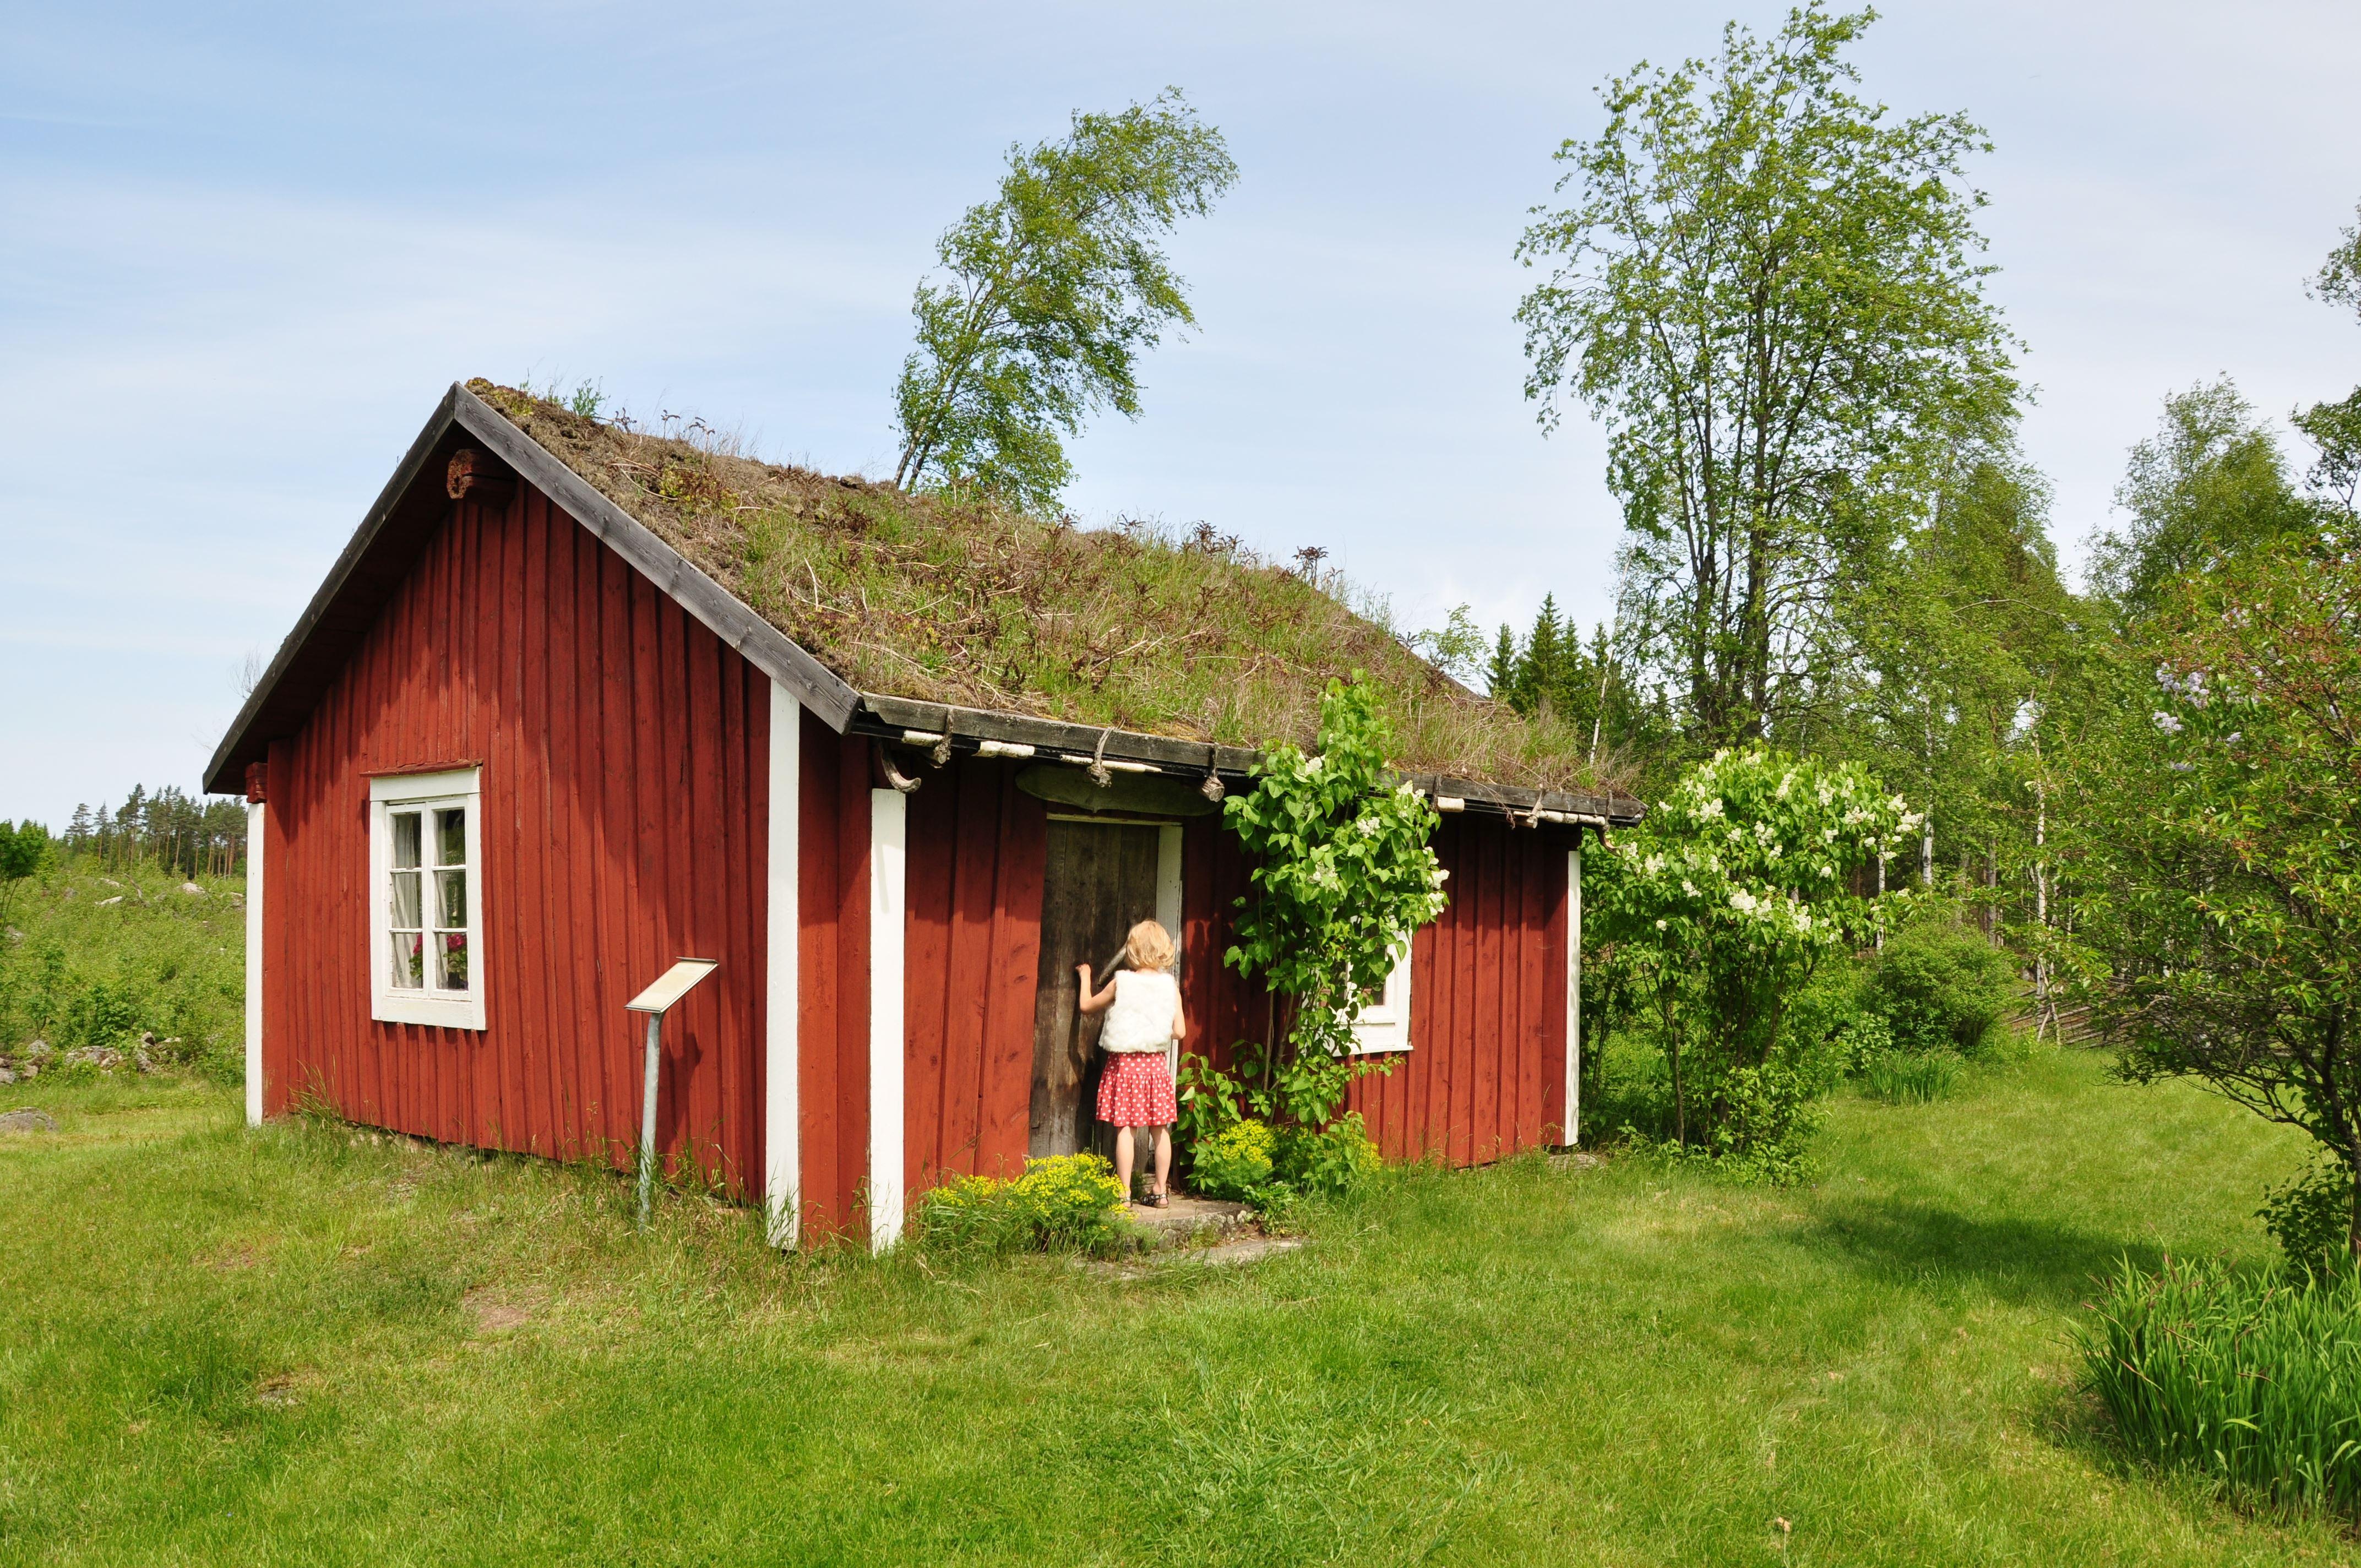 Sagobygdens berättarprogram - Lille Petter Johans kalas